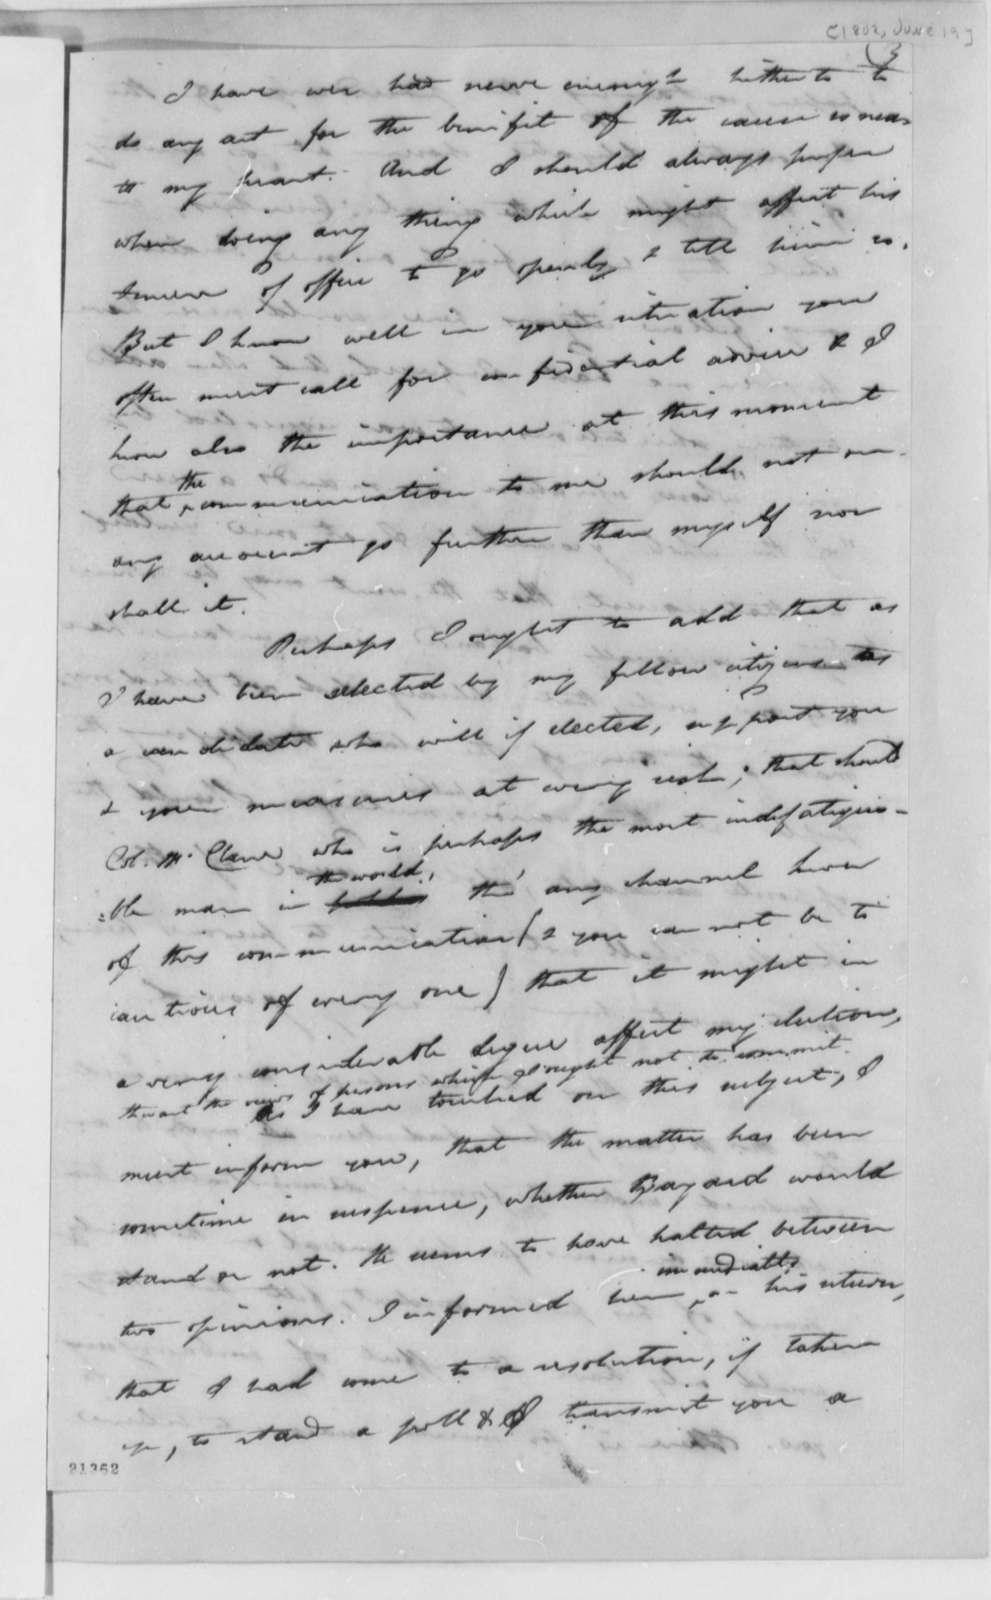 Caesar A. Rodney to Thomas Jefferson, June 19, 1802